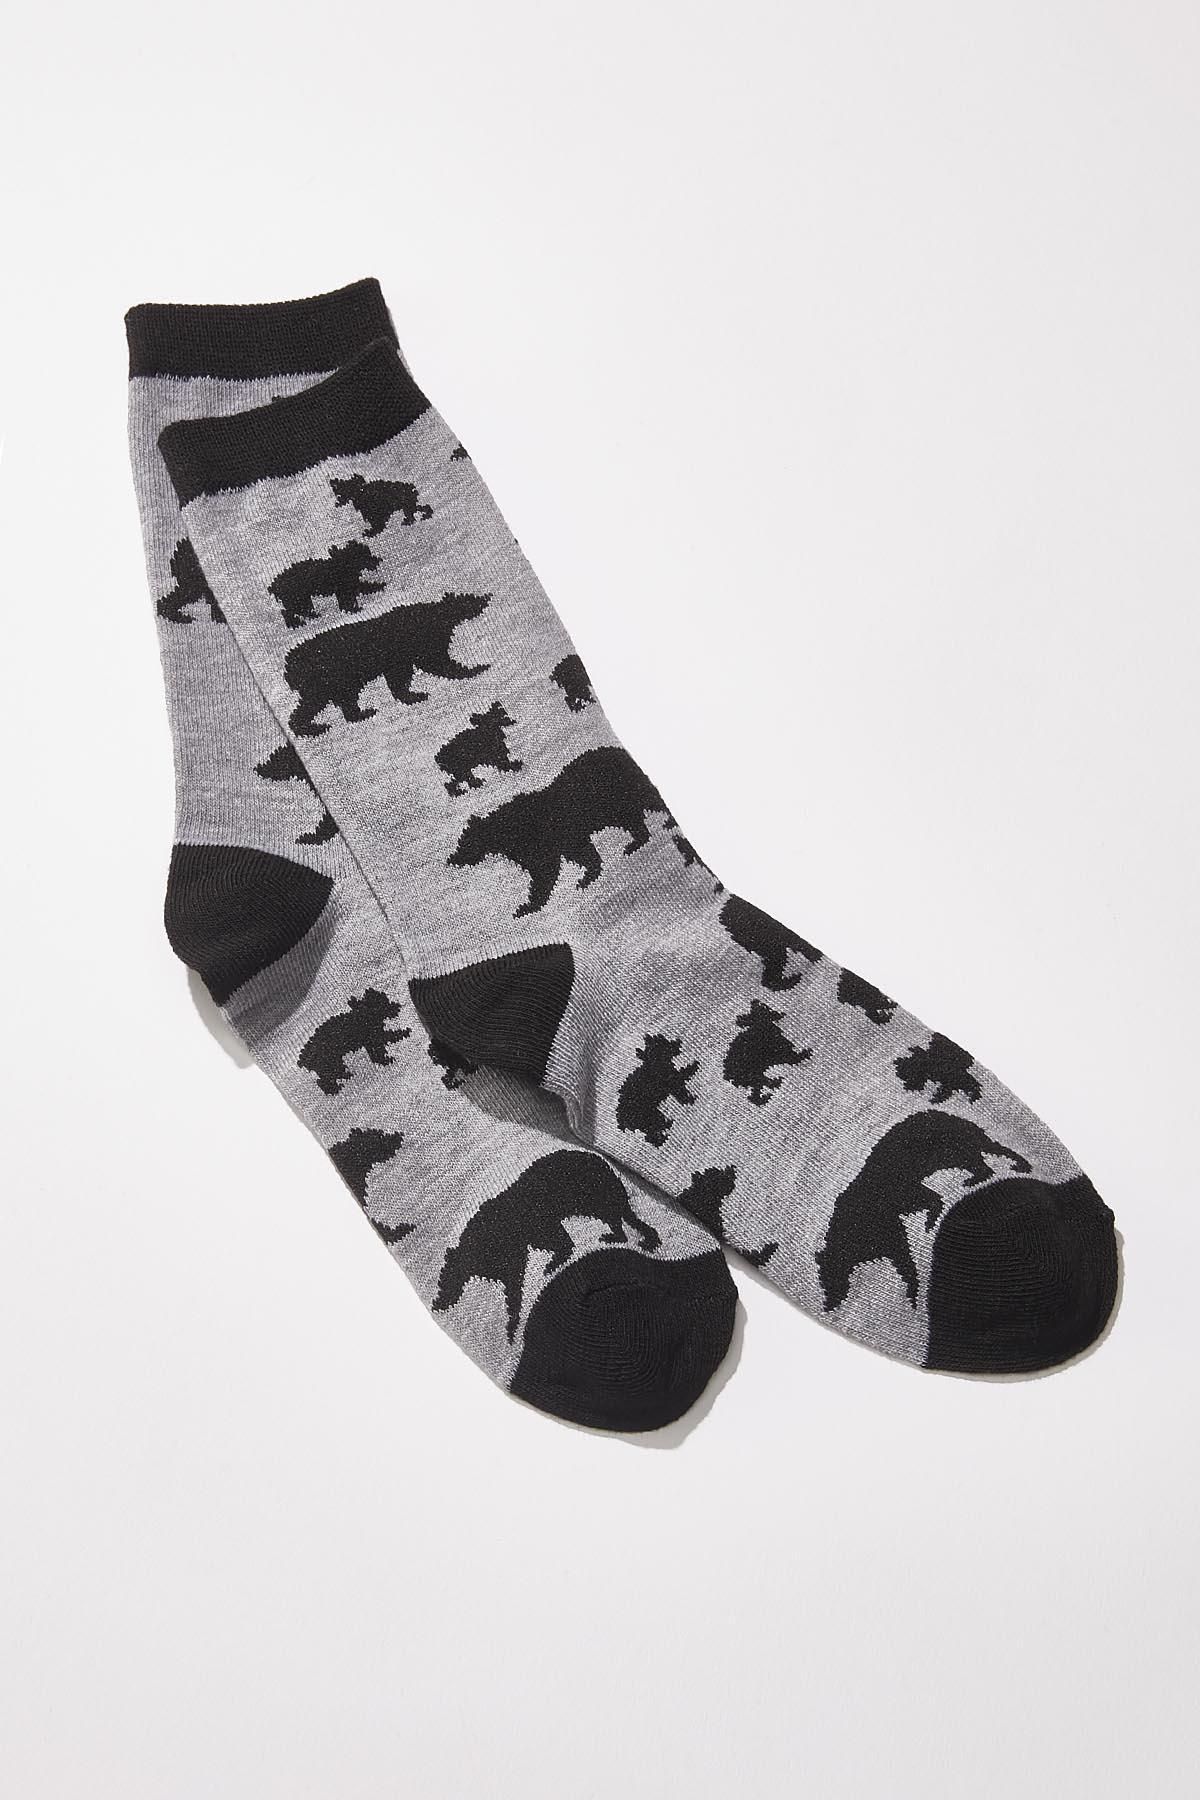 Bear Silhouette Socks